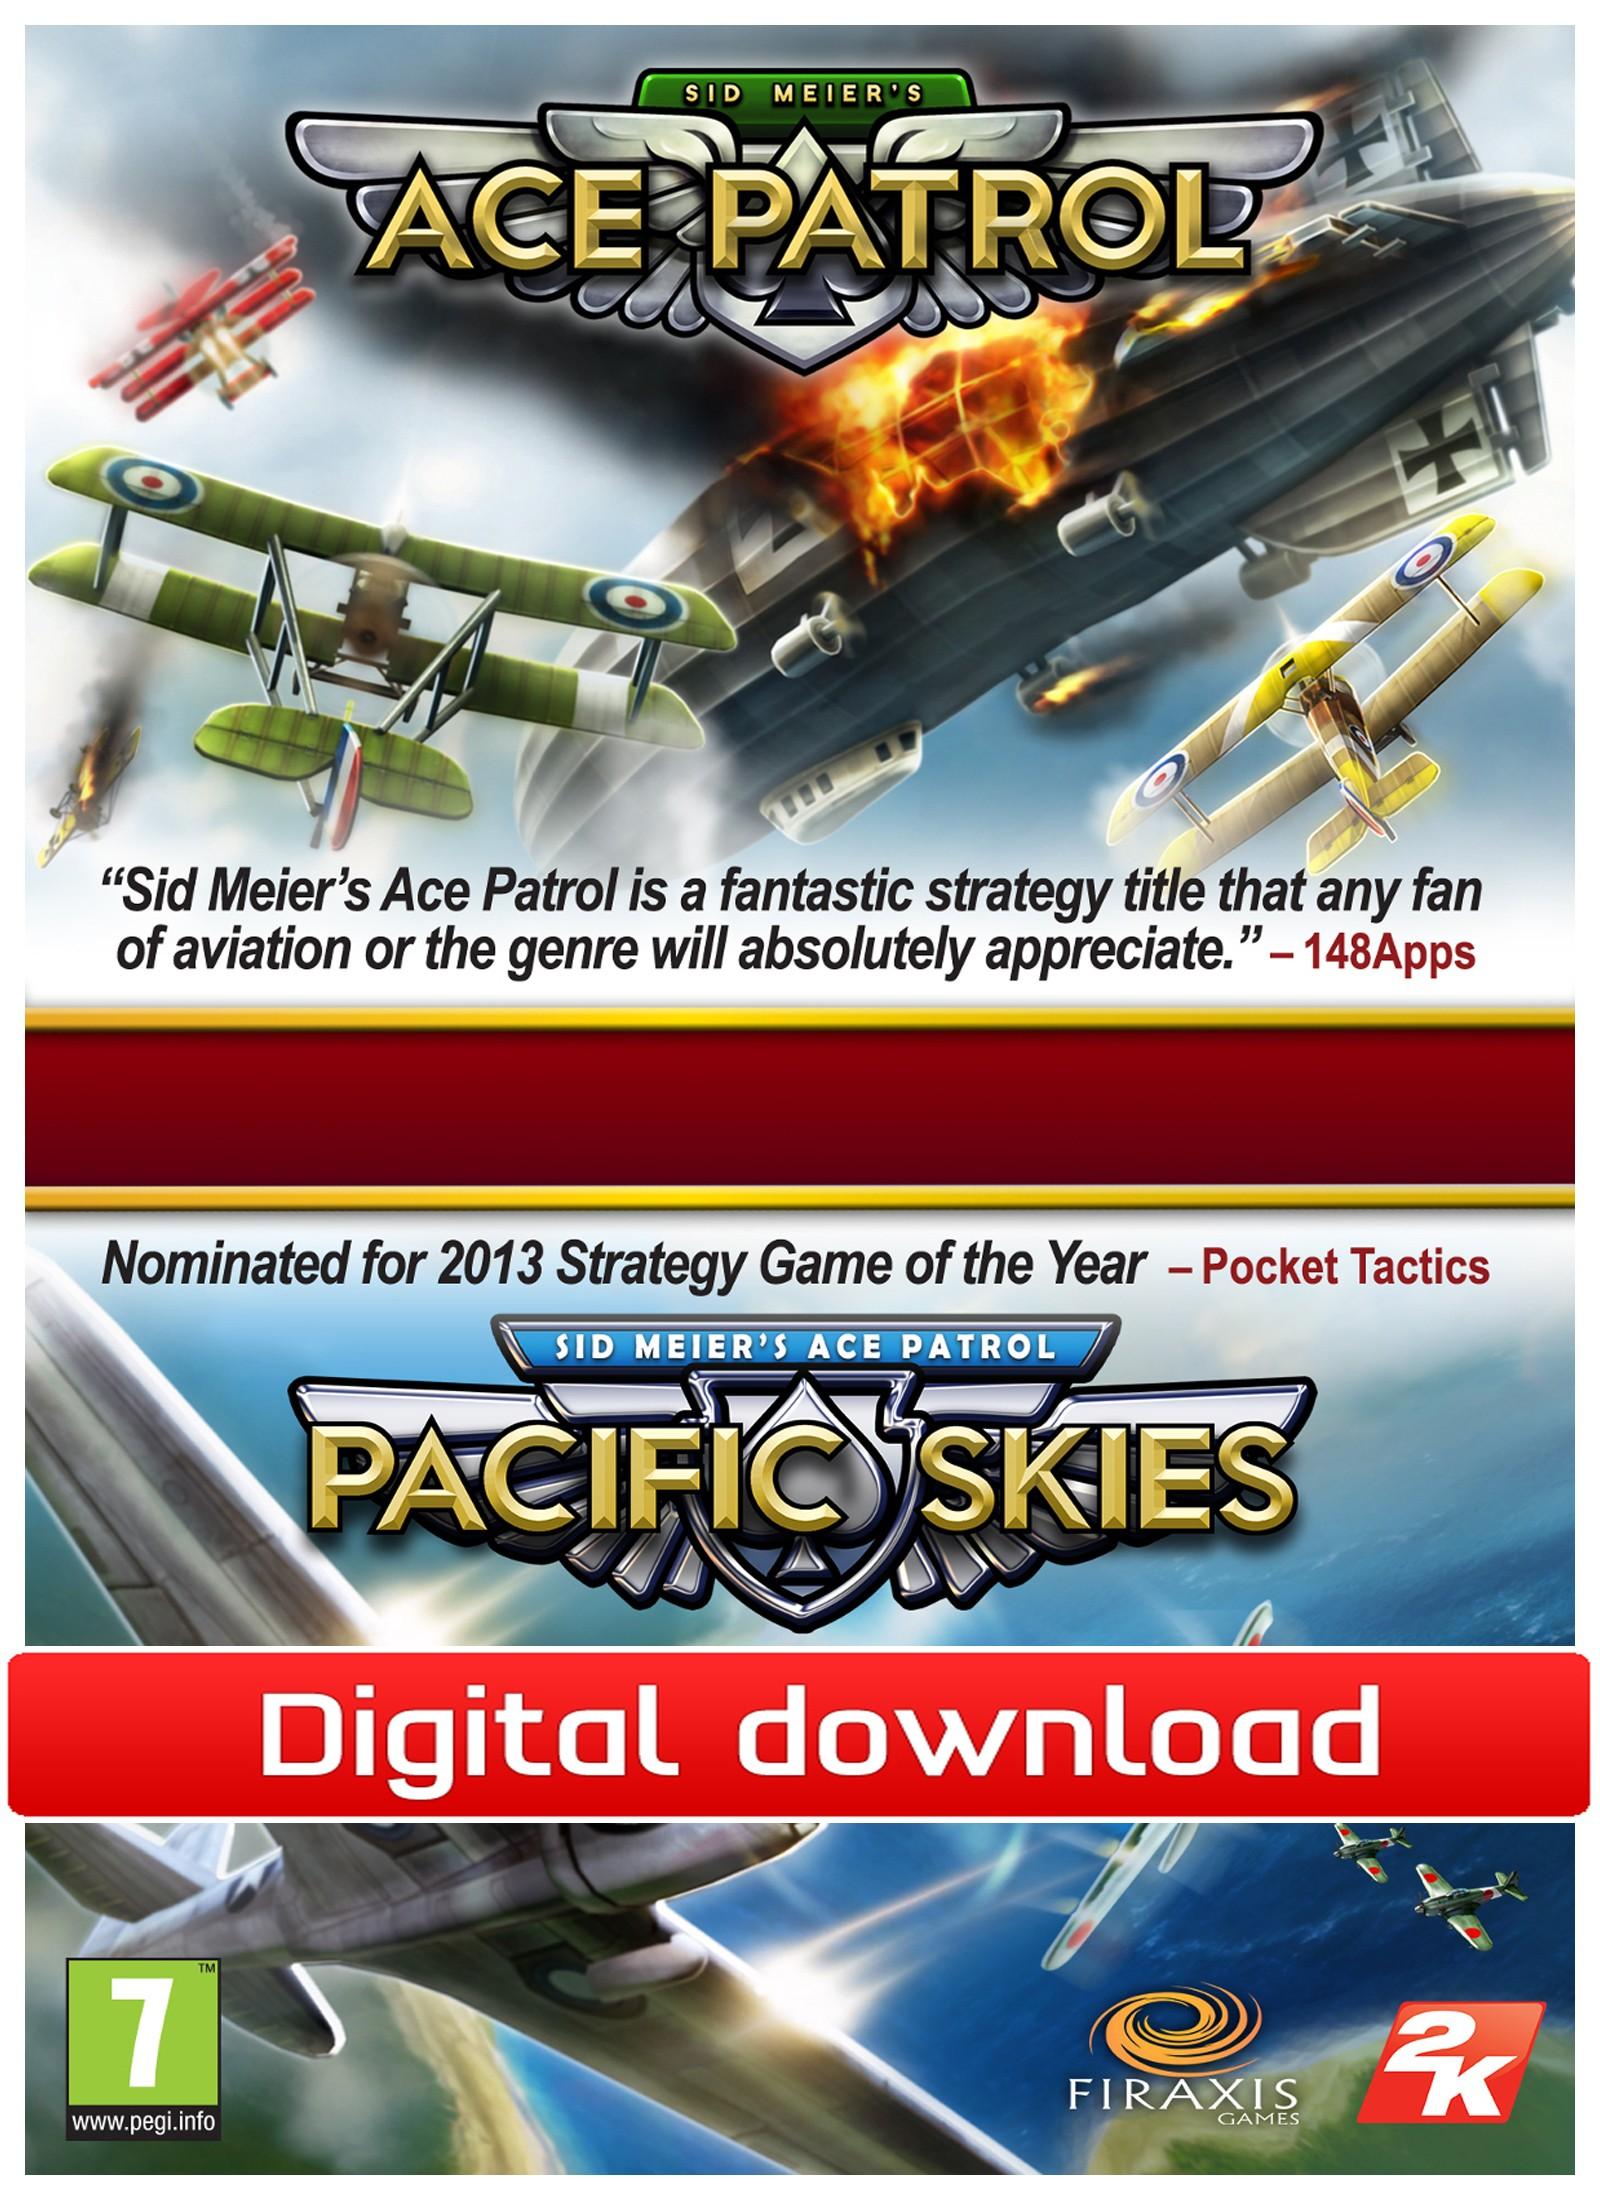 34640 : Ace Patrol Bundle (PC nedlastning)